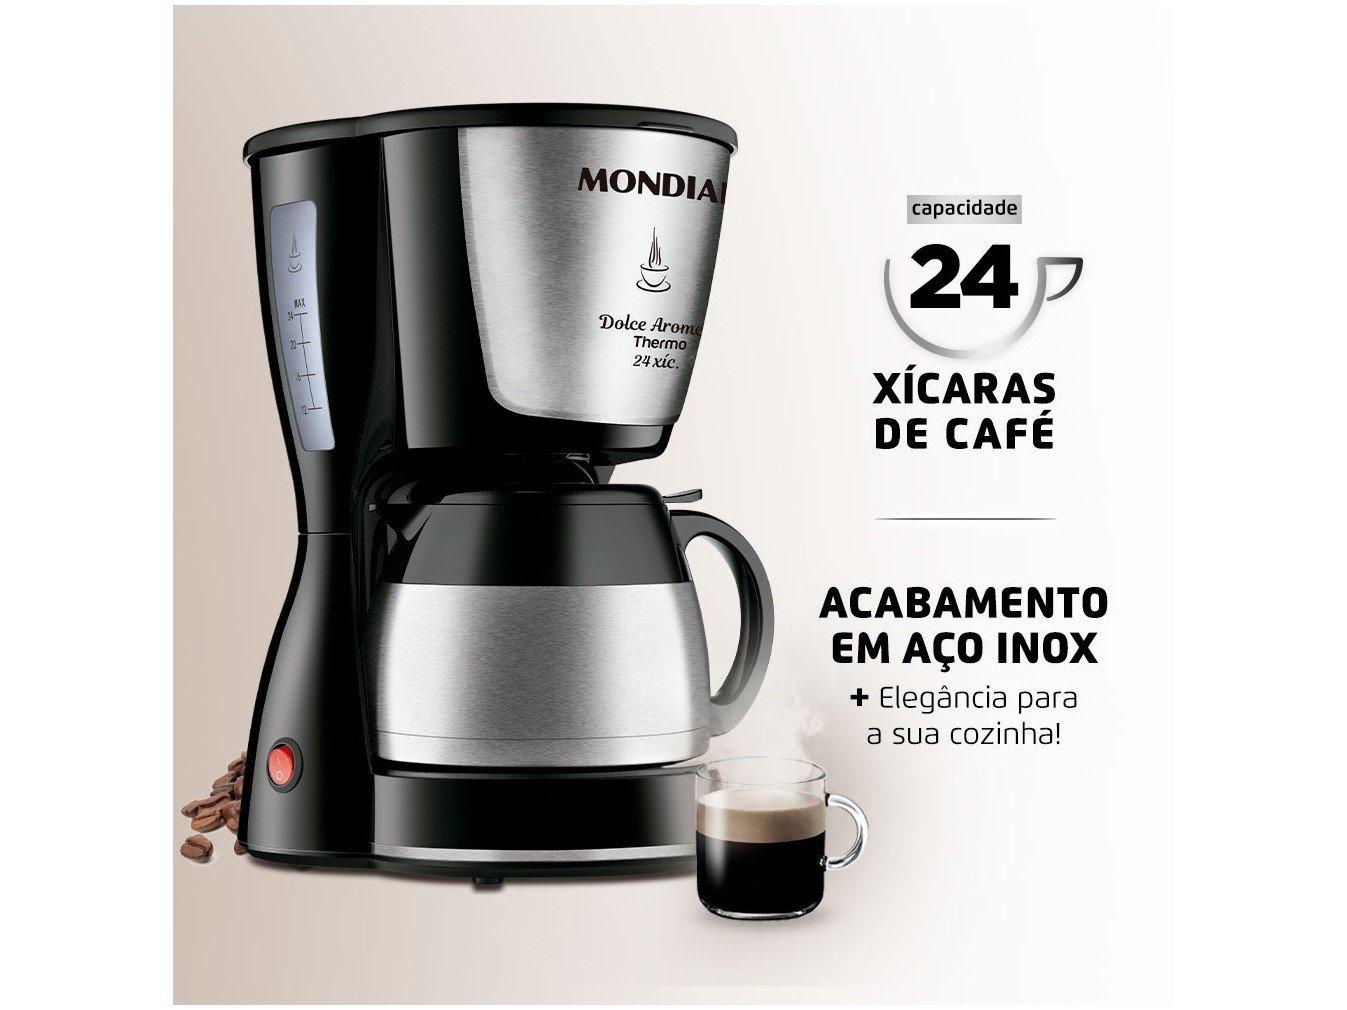 Cafeteira Elétrica Mondial Dolce Arome Thermo Inox C-33 JT 24 Xícaras - Preto - 110V - 4